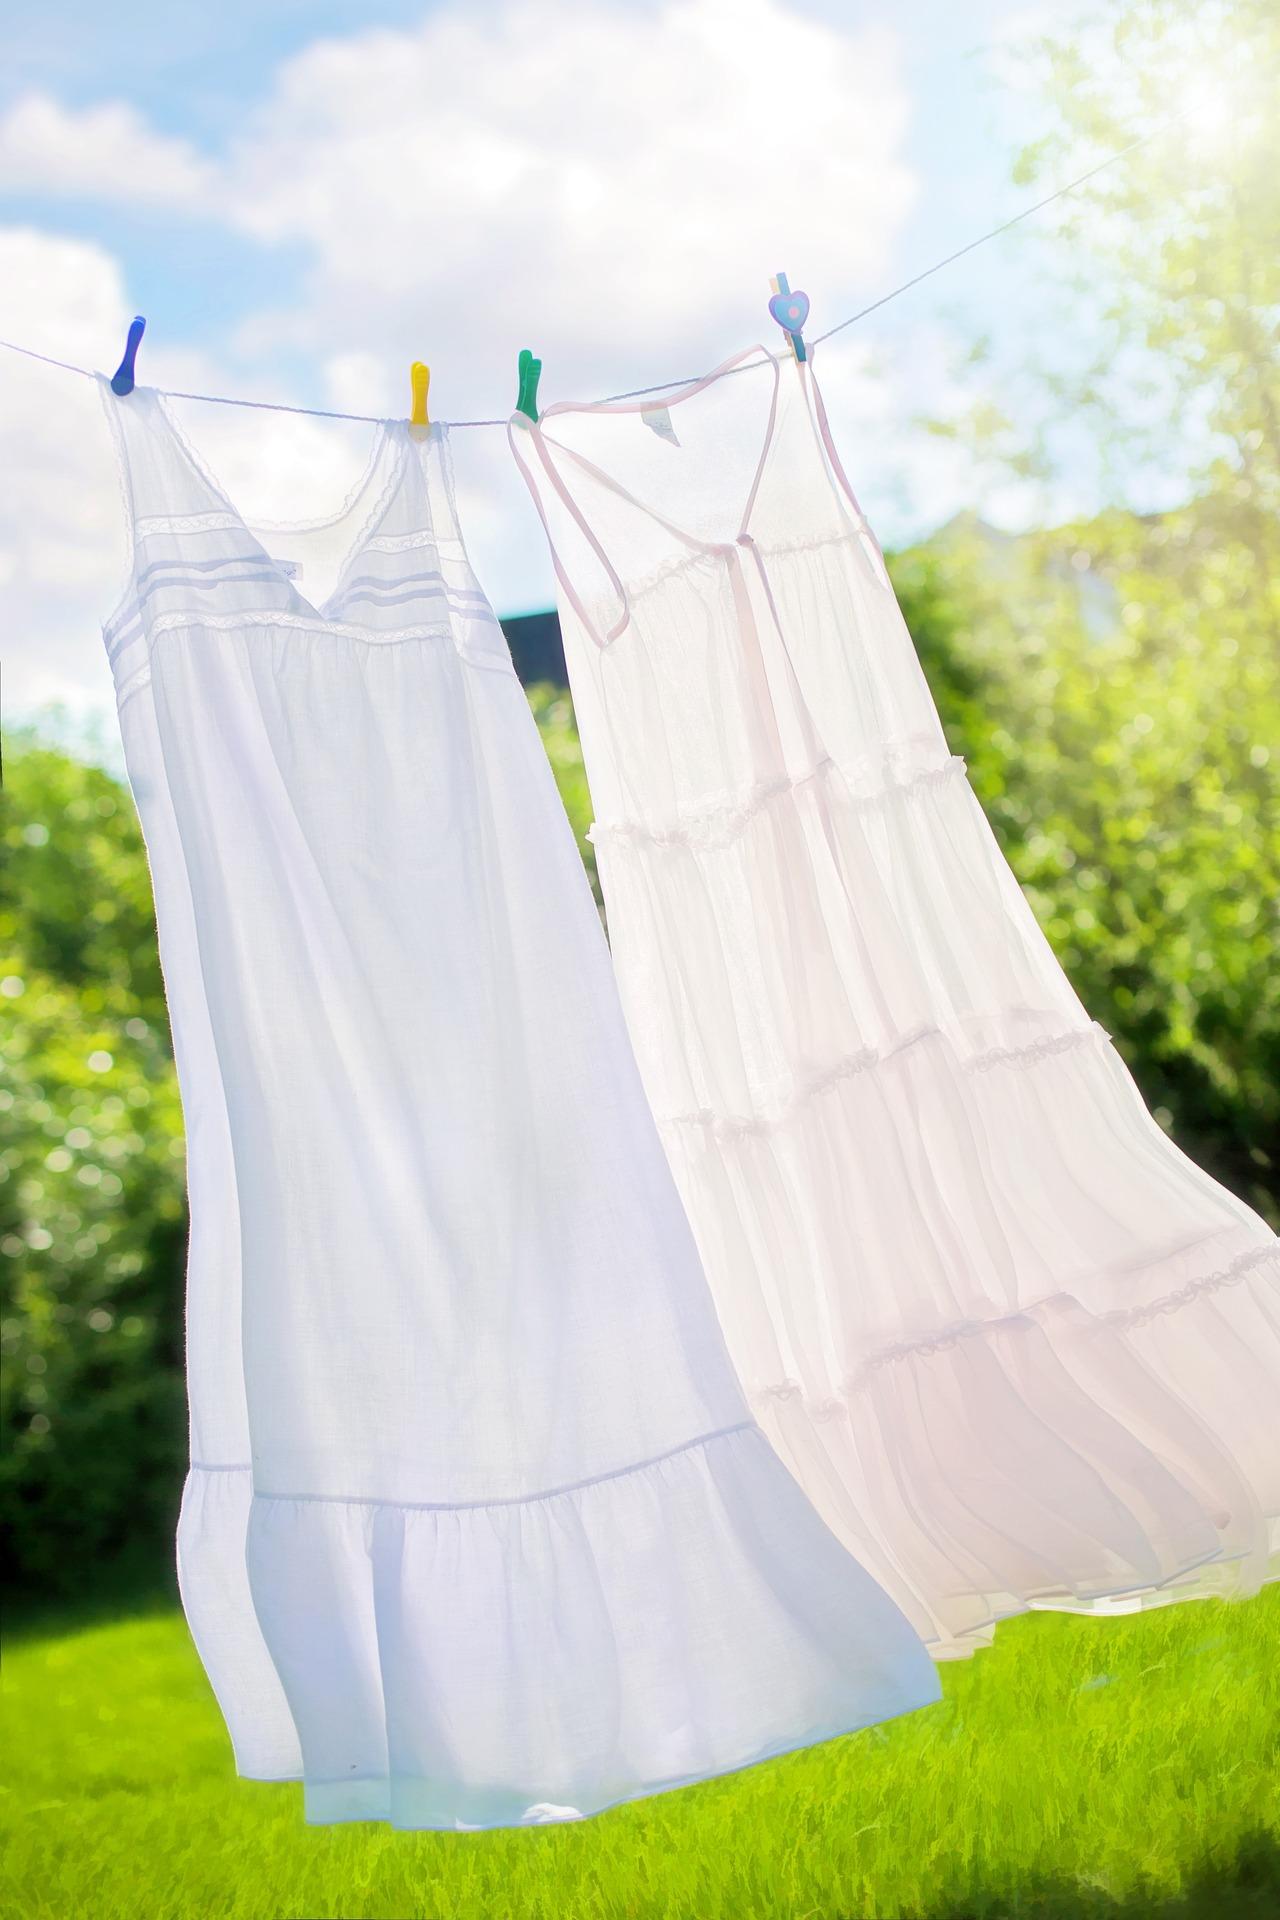 best oxygen bleach laundry cleaner